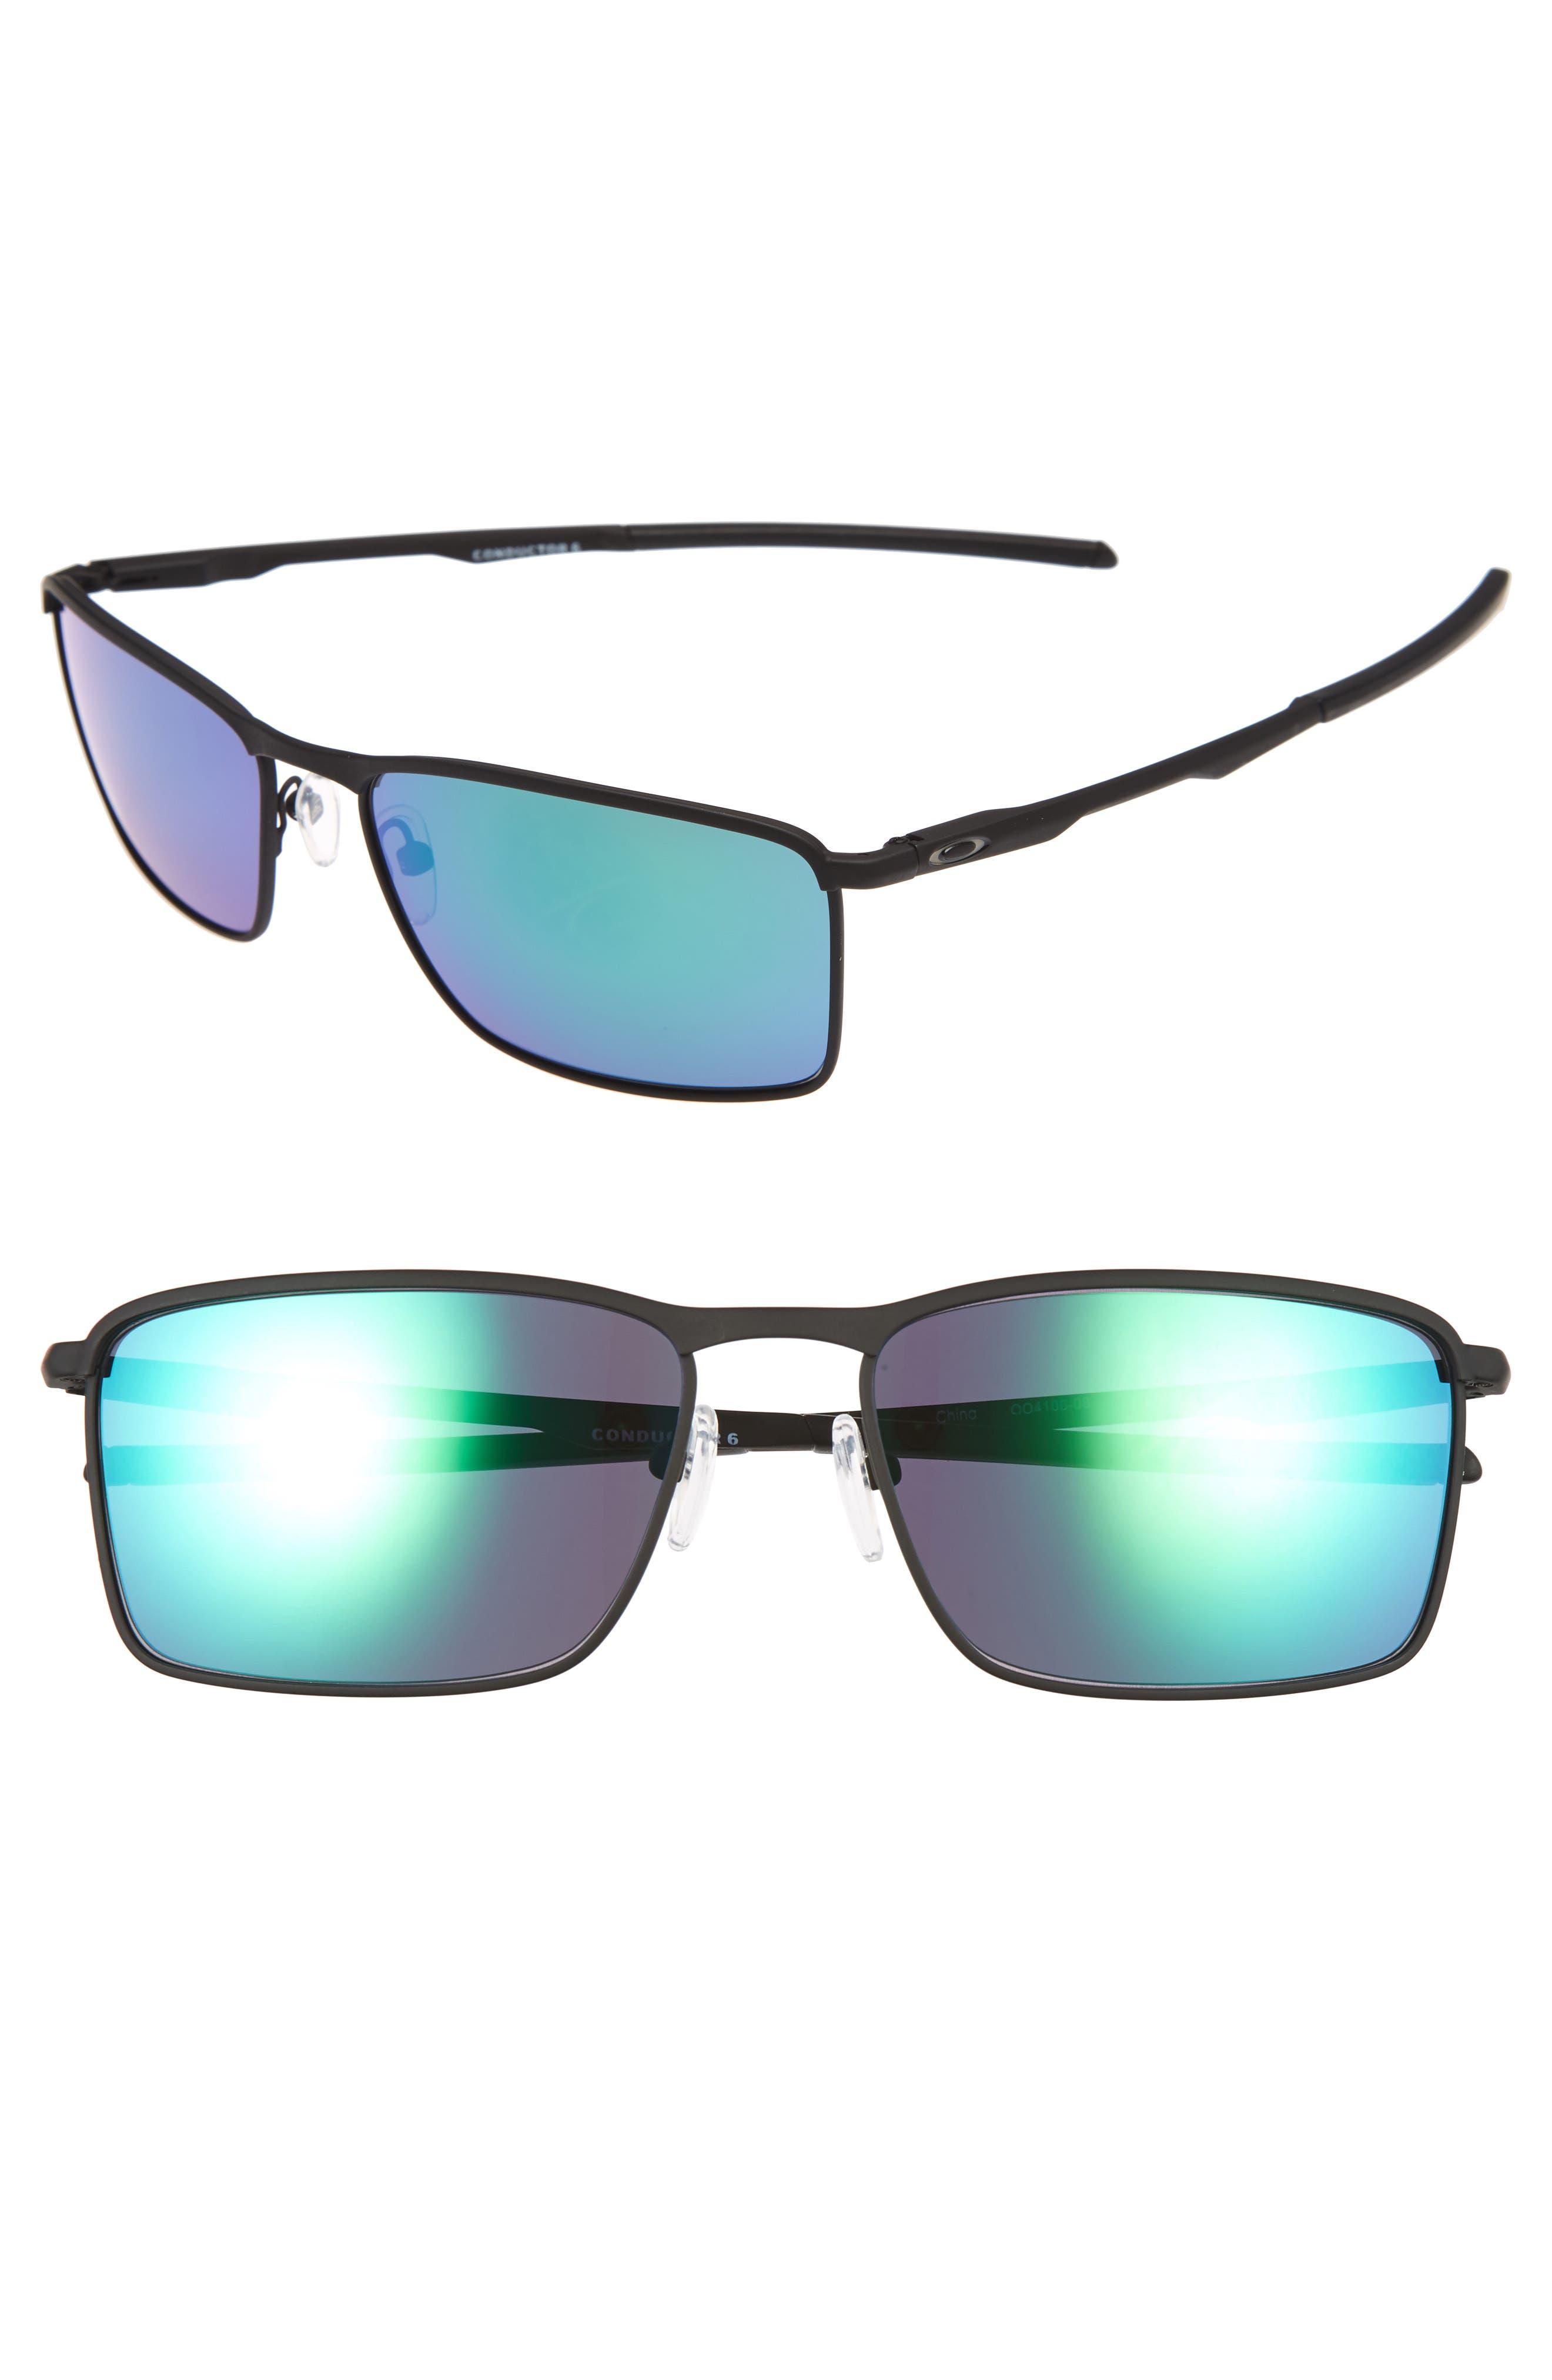 Conductor 6 58mm Polarized Sunglasses,                             Alternate thumbnail 2, color,                             001